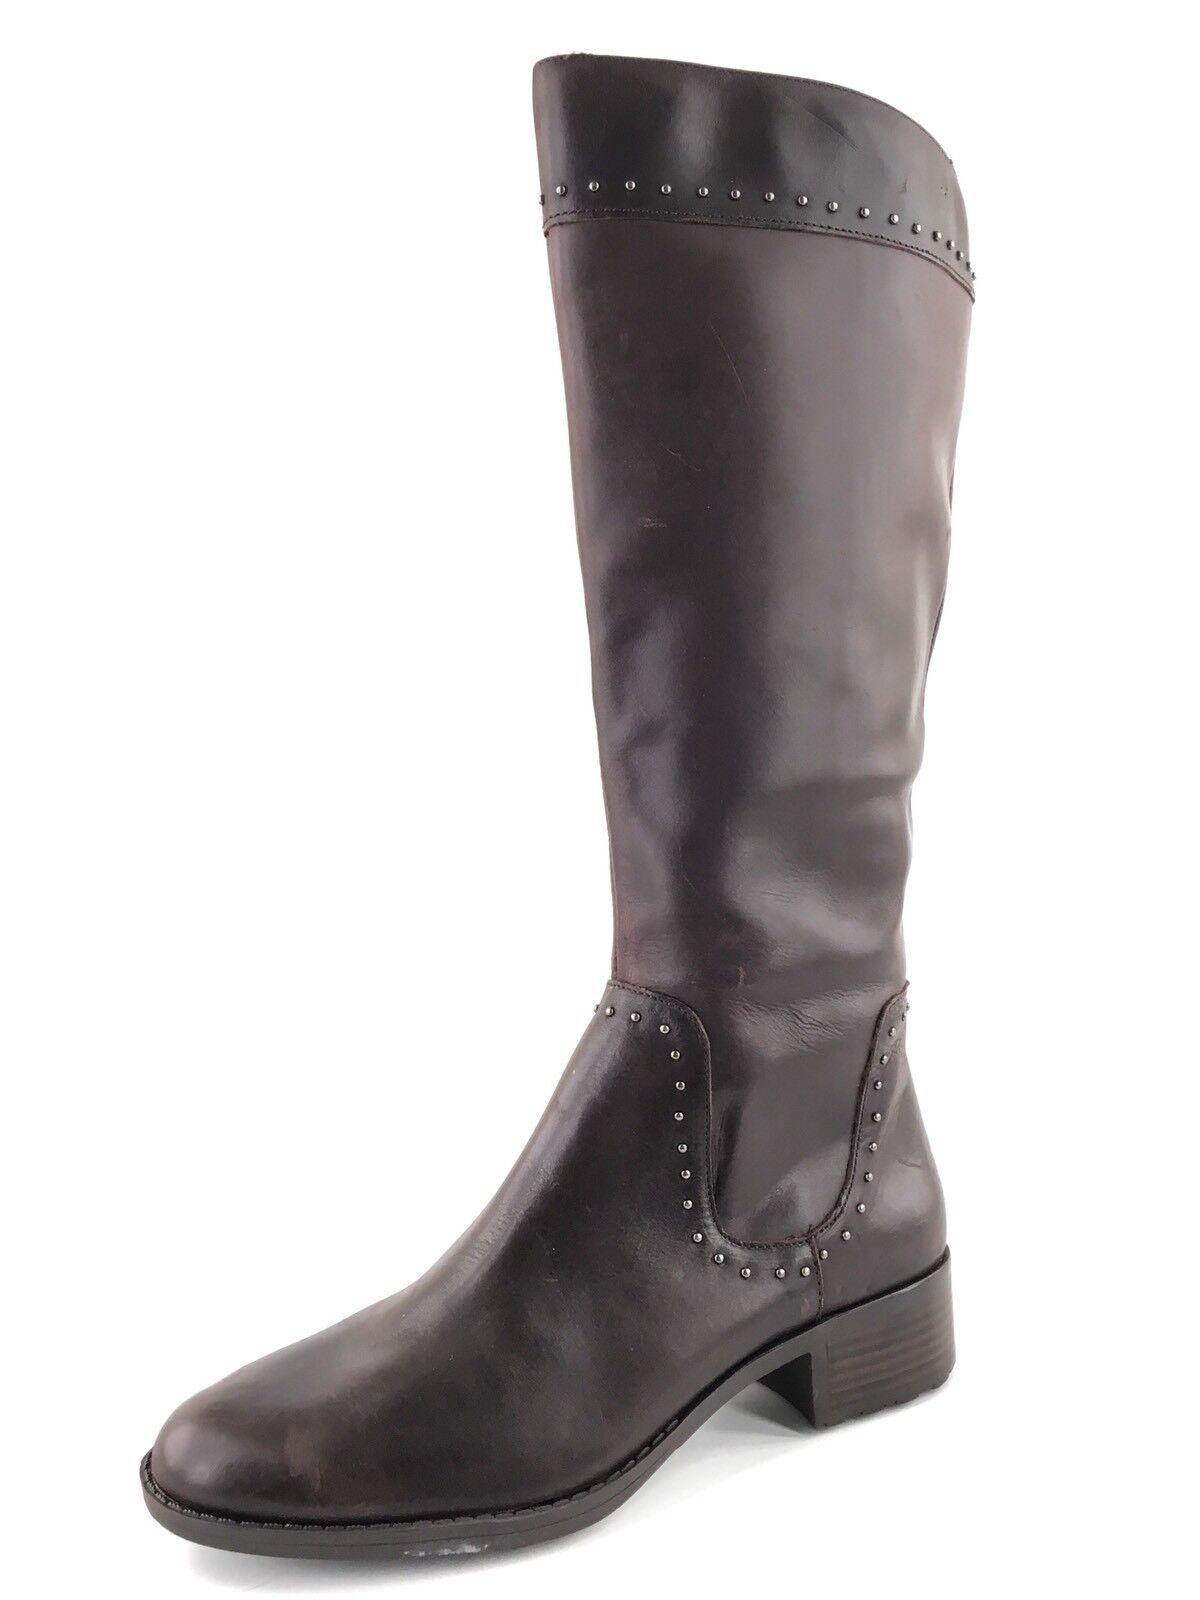 Circa Joan & David Talaro Braun Leder Knee High Stiefel Damens's Größe 7.5 M